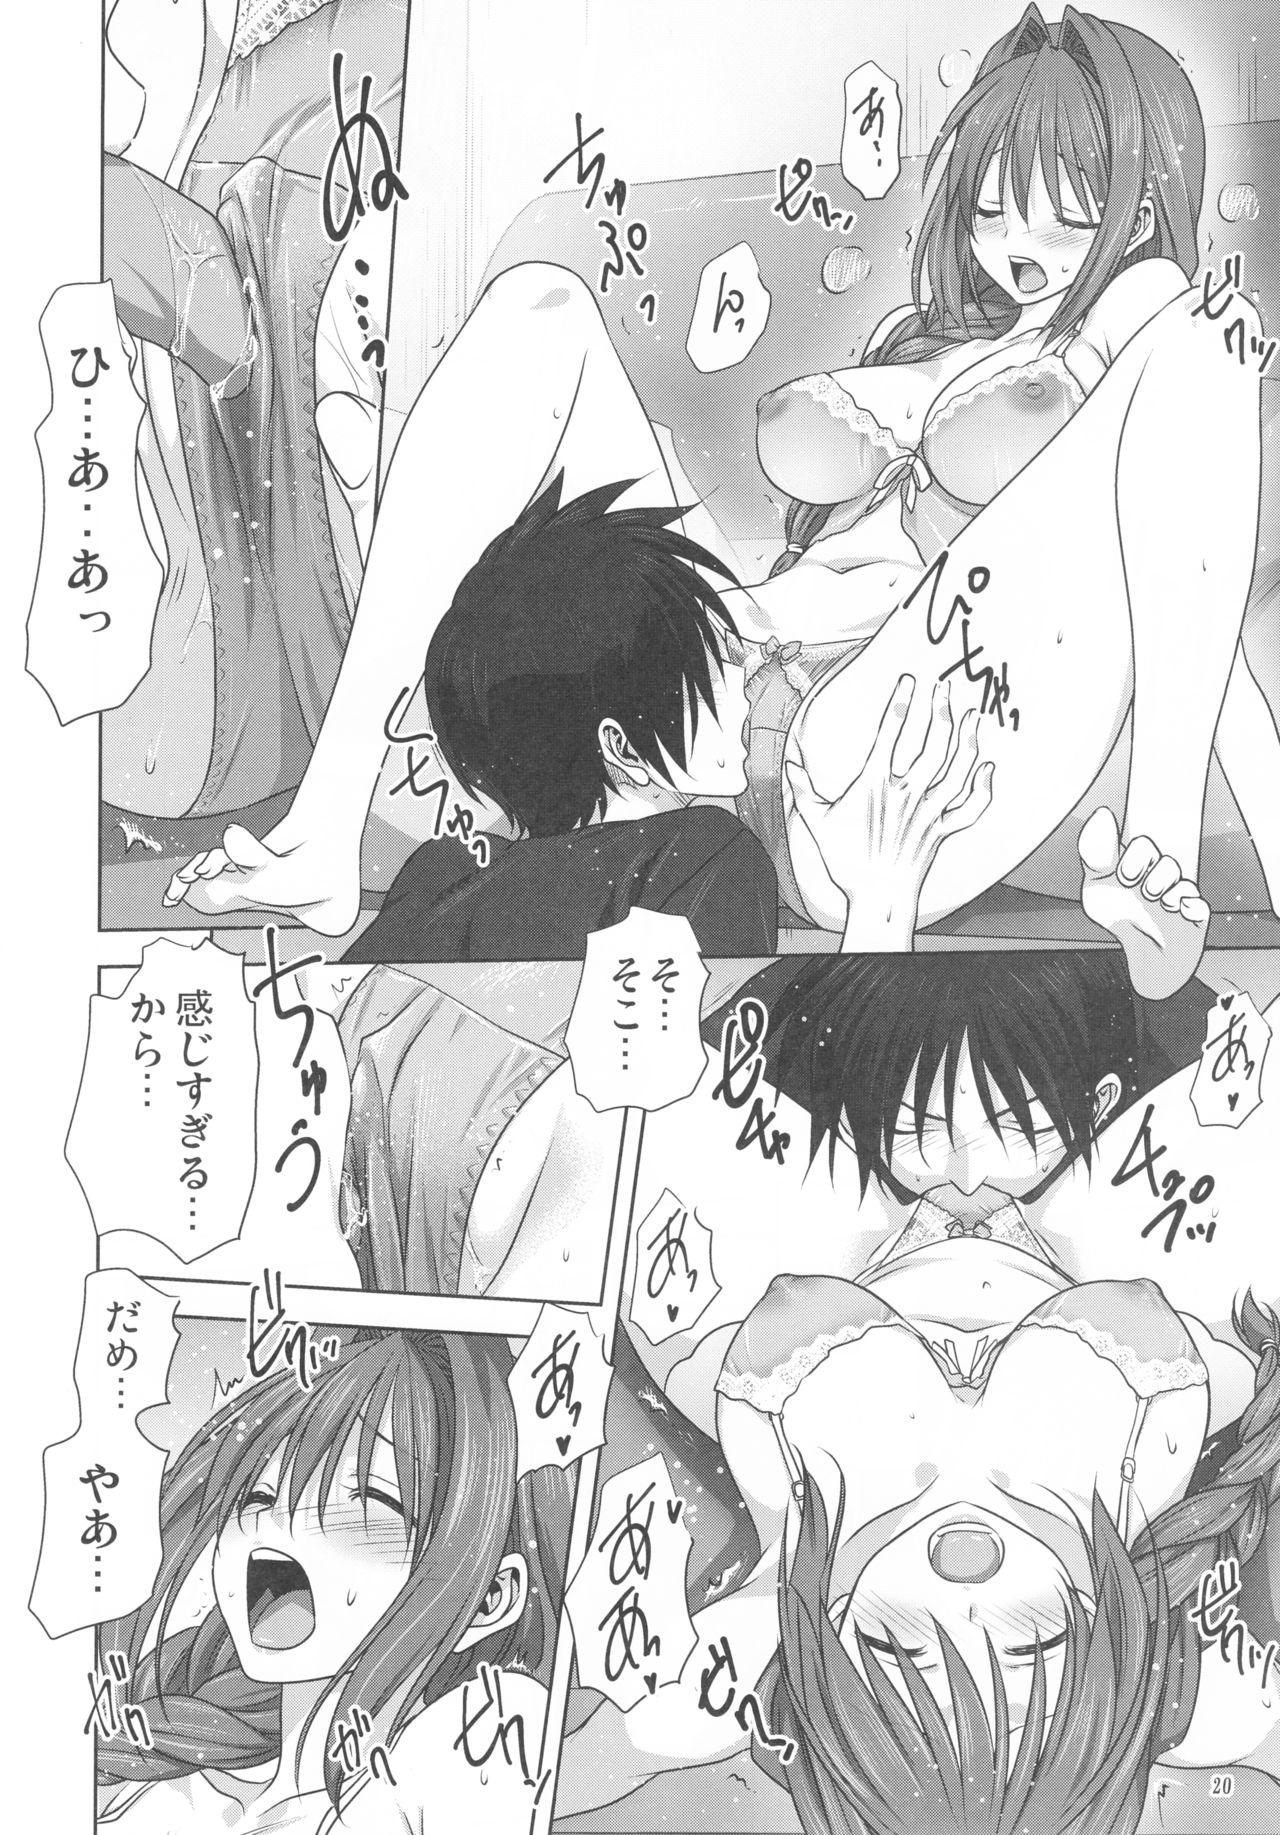 Akiko-san to Issho 19 18